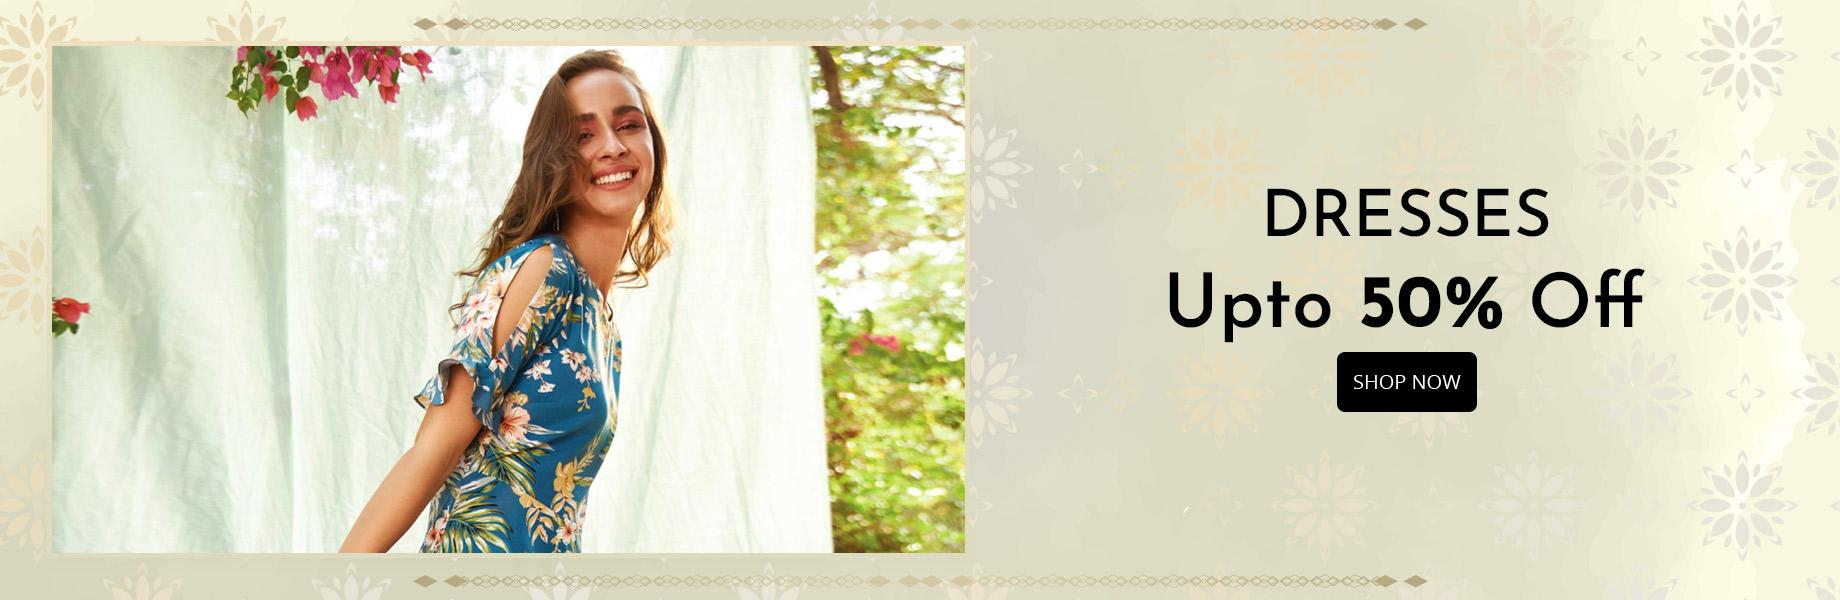 Homepage-Carousals-Dresses-Web.jpg